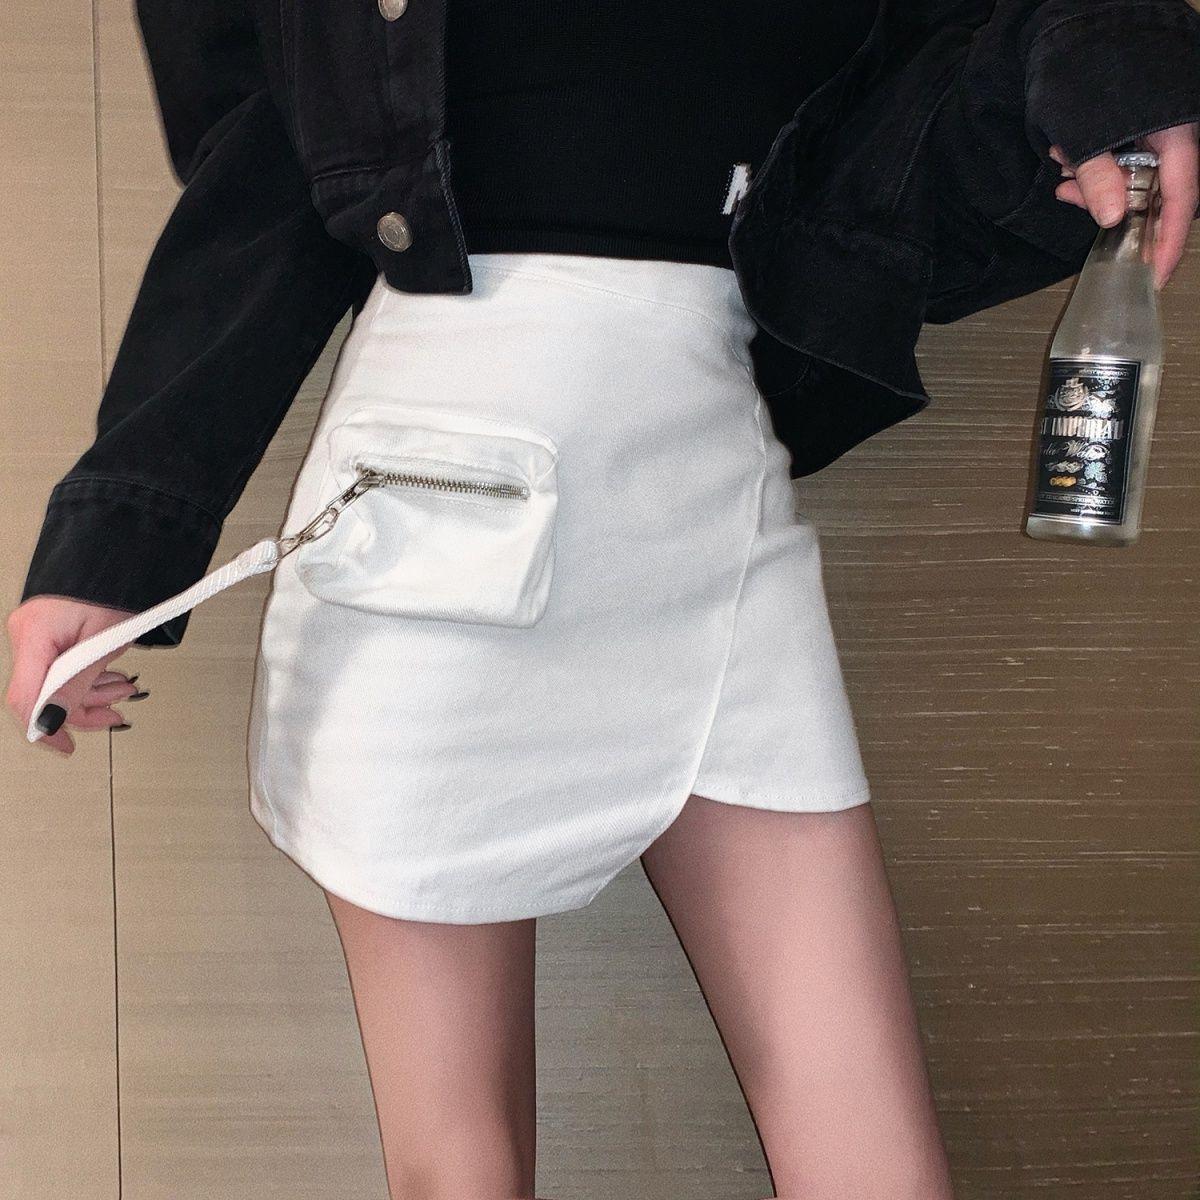 Chic self retaining denim skirt with seven sauce